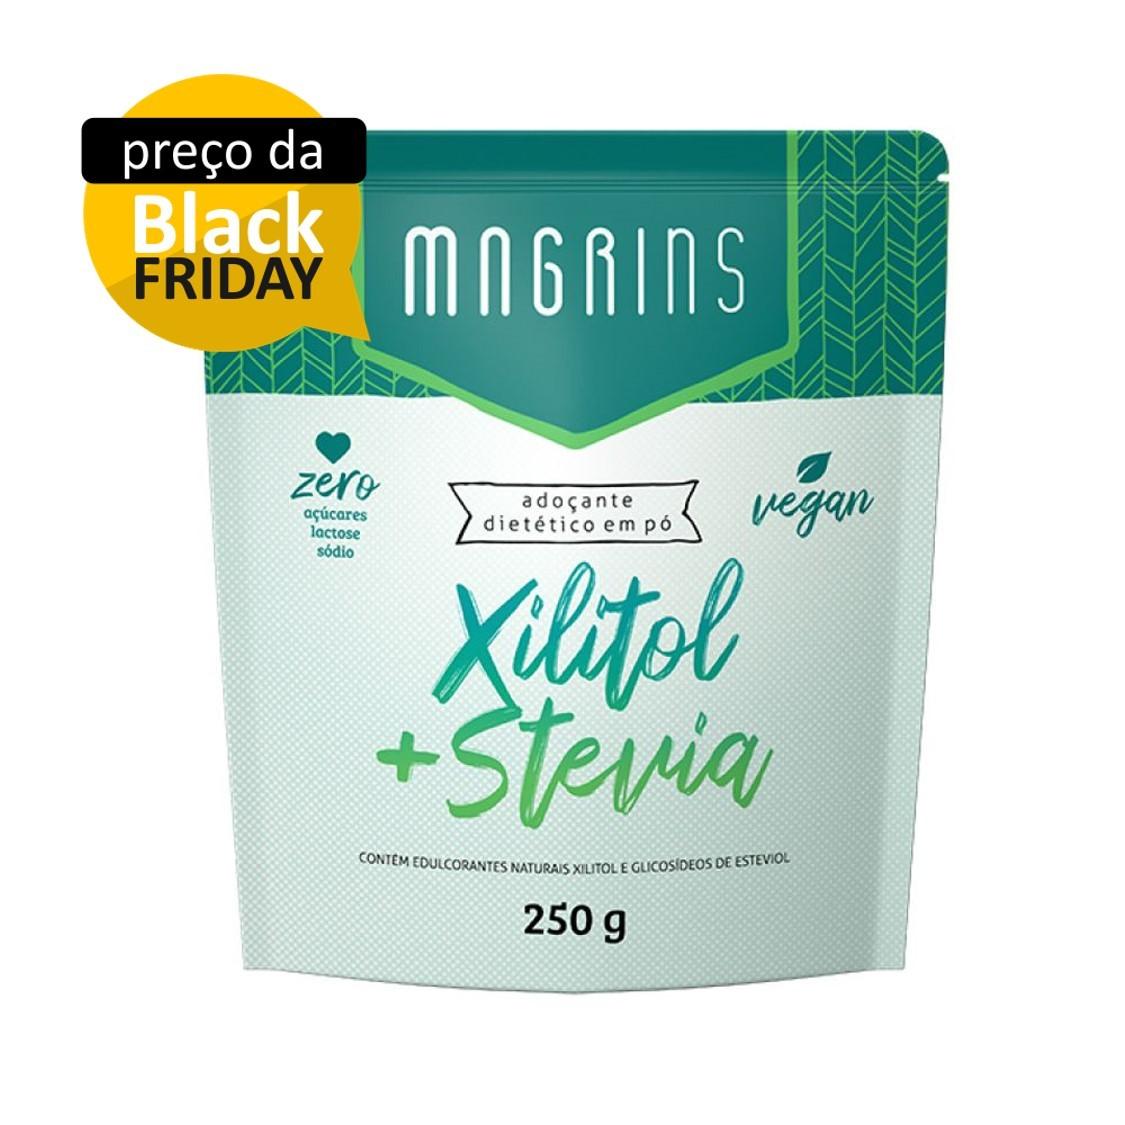 Adoçante Xilitol + Stevia Pouch Magrins 250g  - Tudo Low Carb